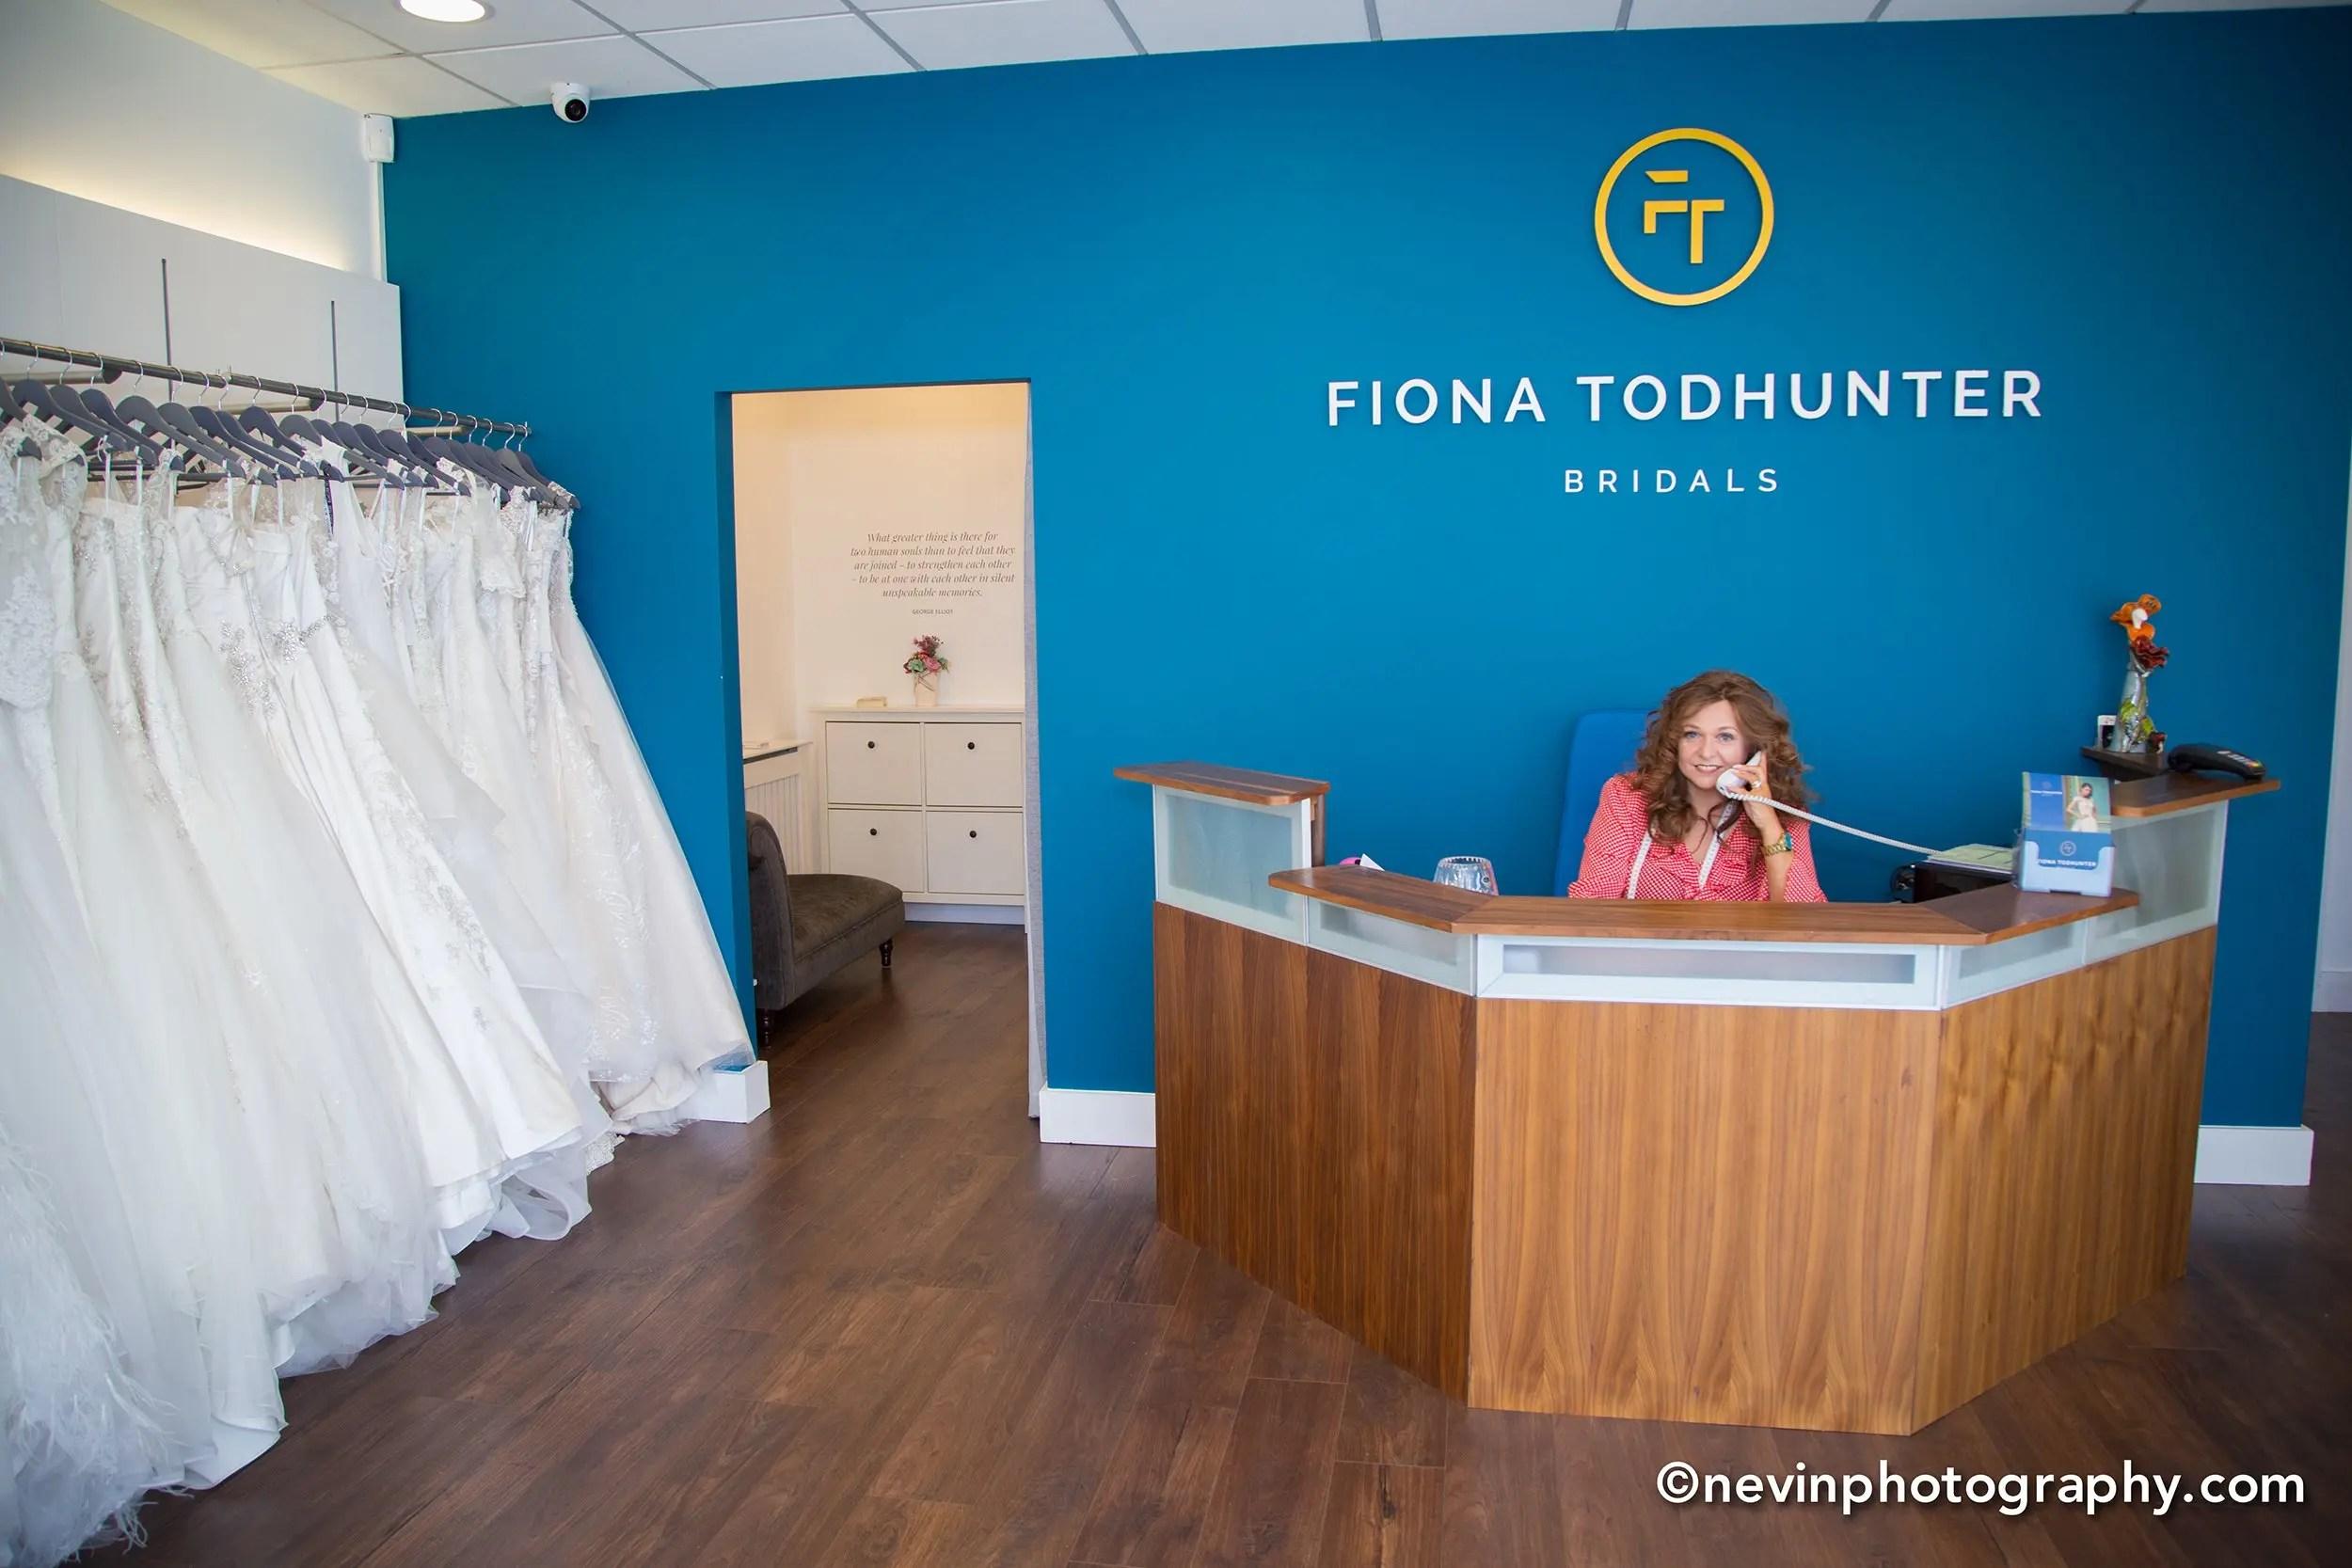 Fiona Todhunter Bridals